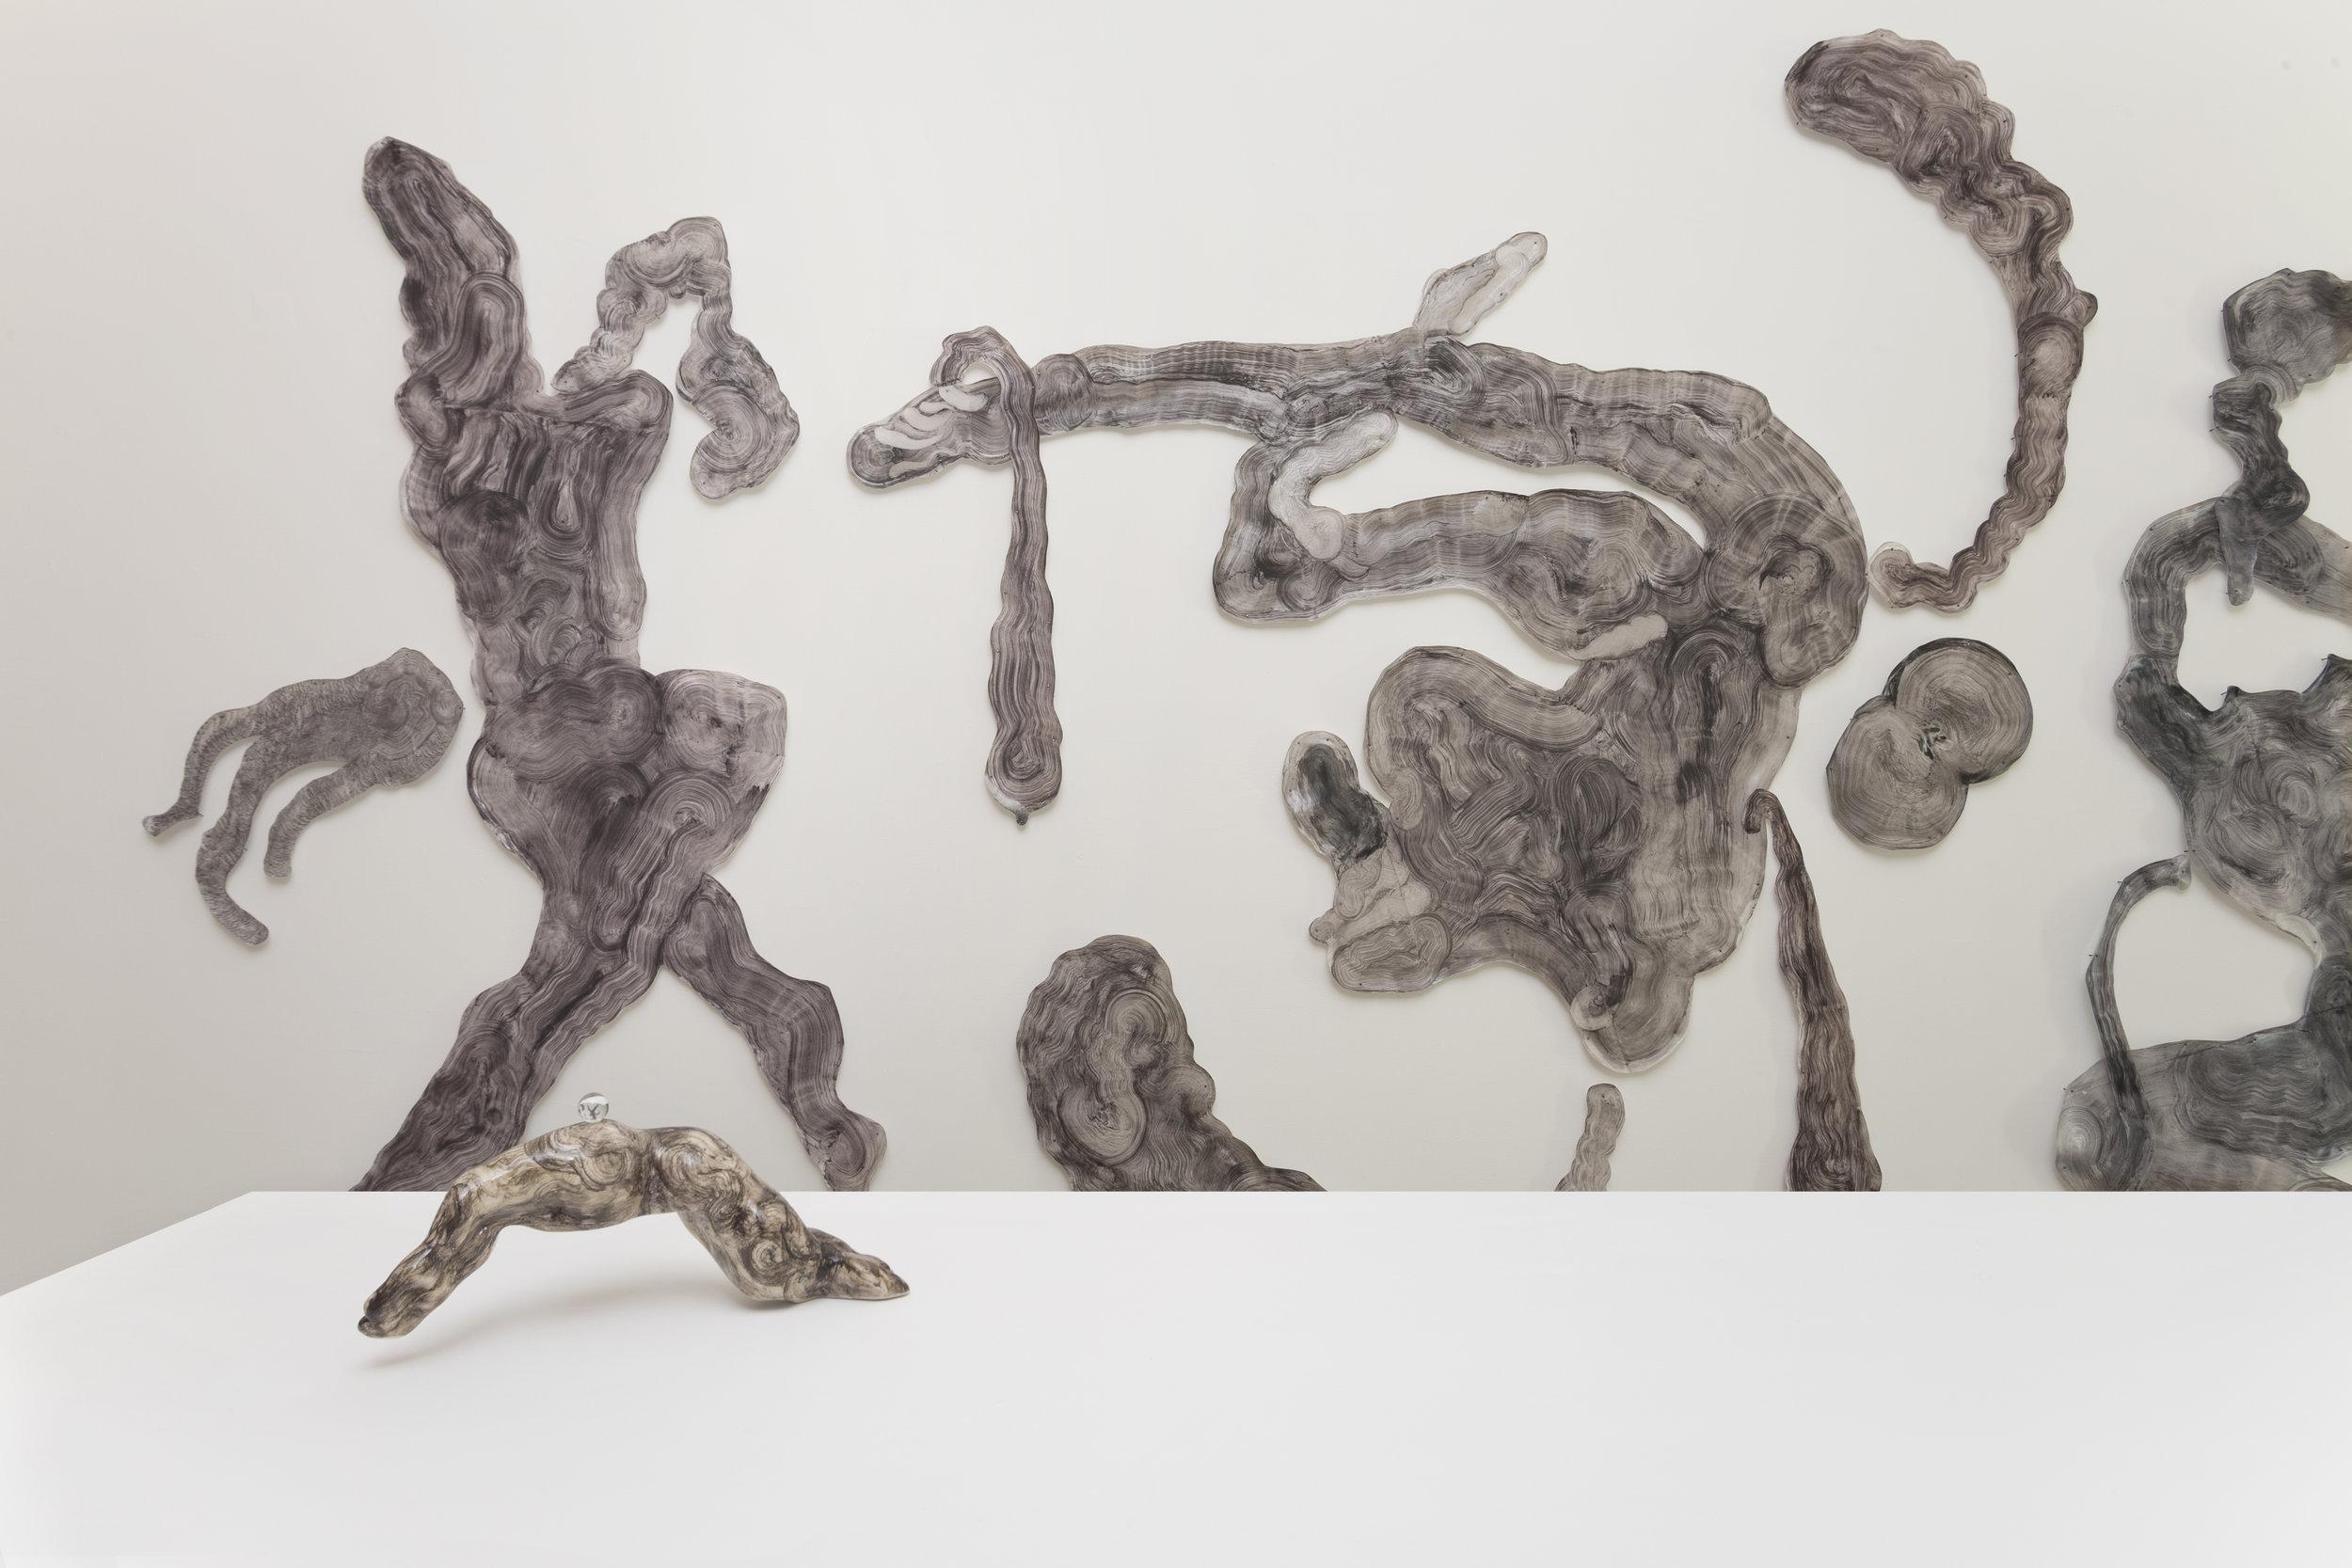 """Iposcenio"" - Guglielmo Castelli, Installation view"